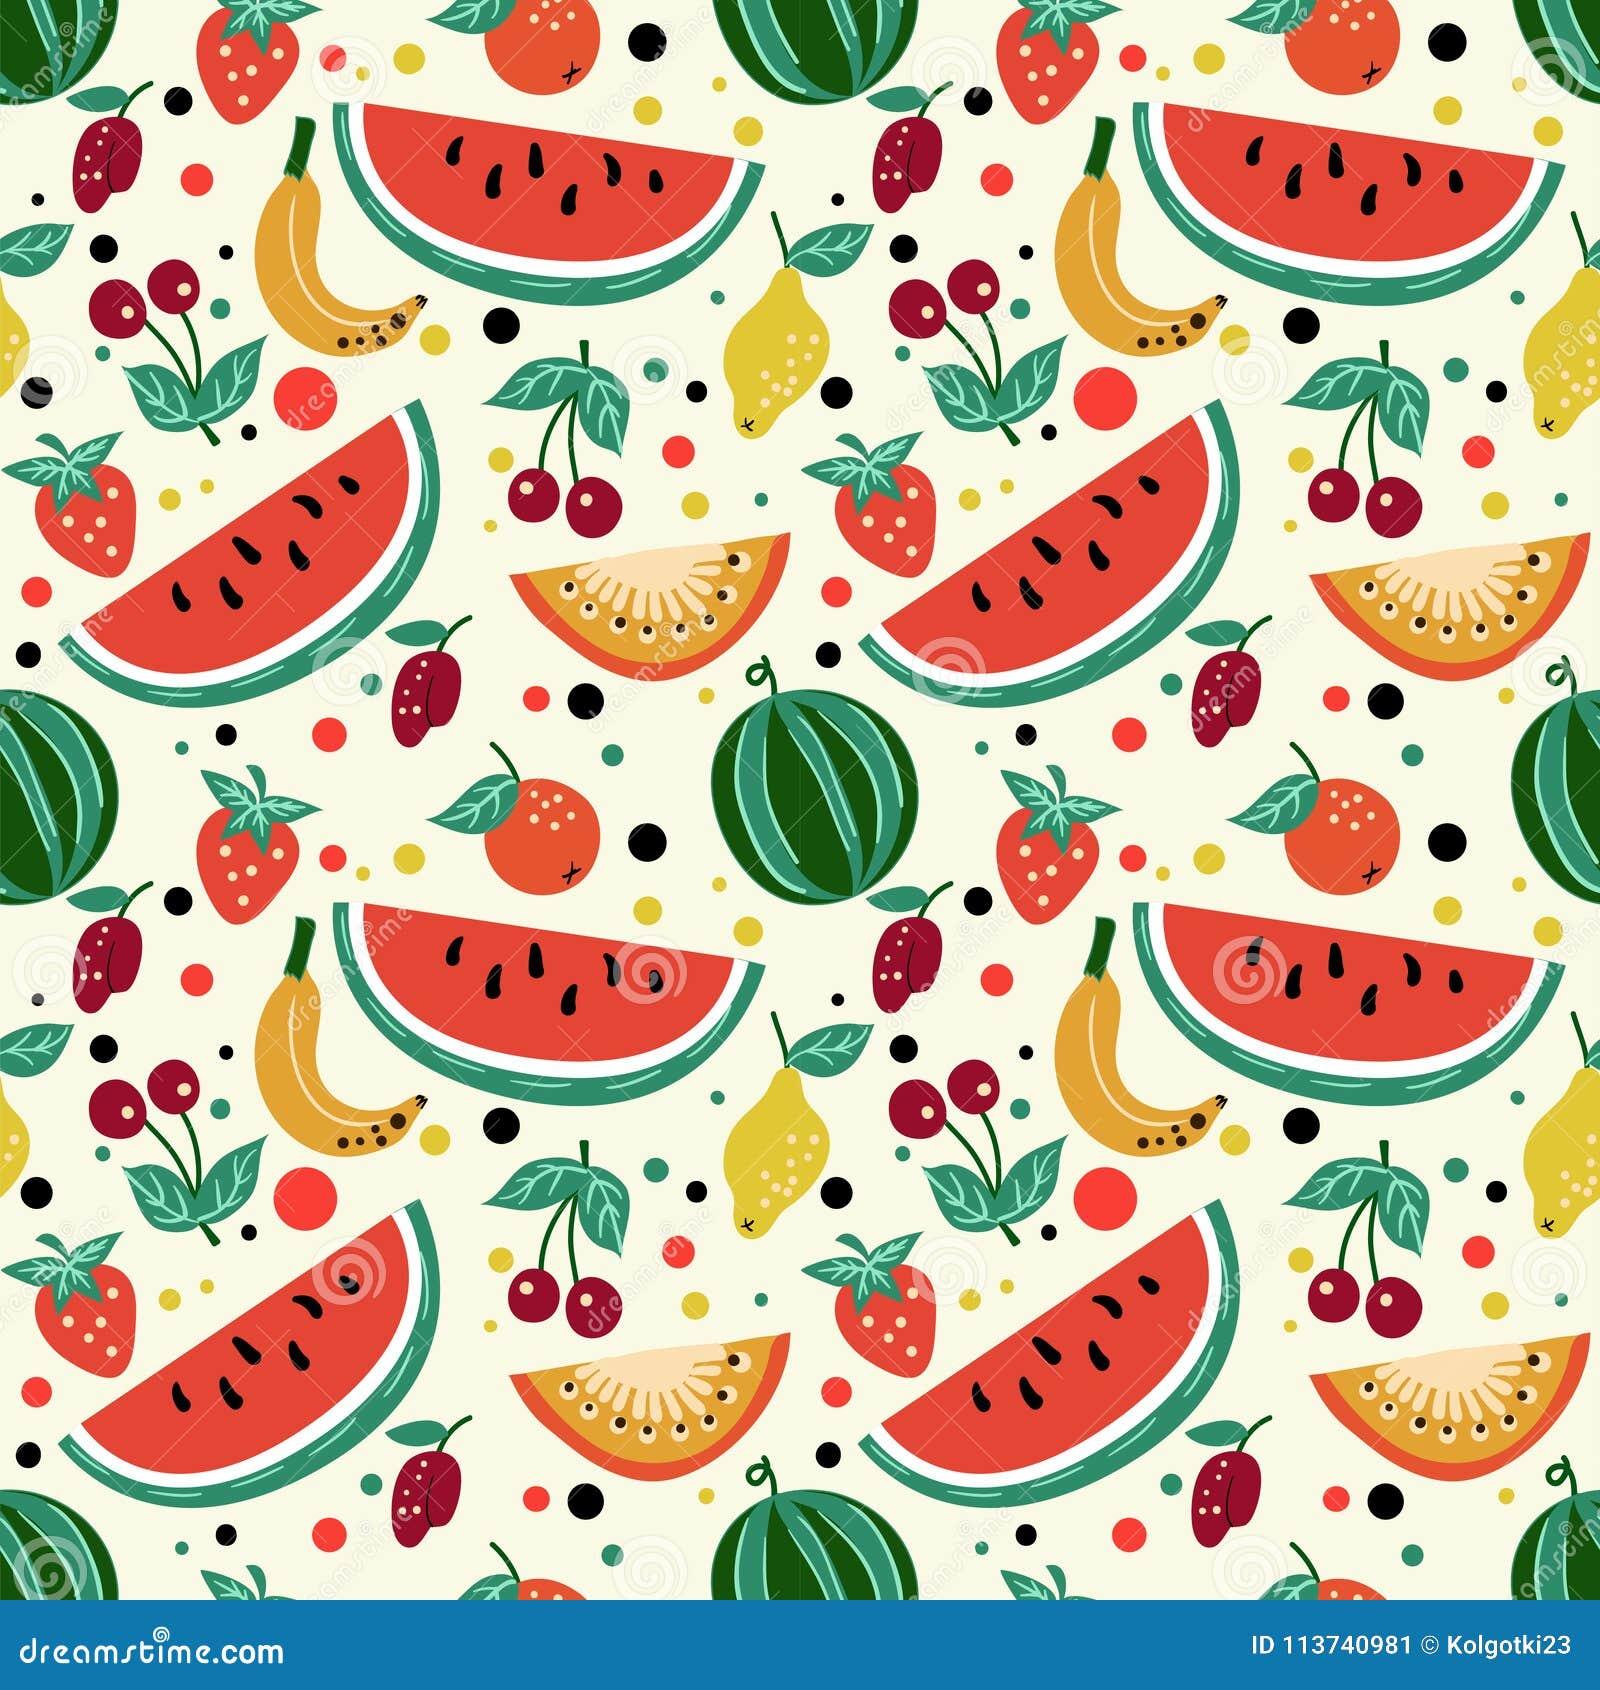 Naadloos patroon van vruchten, watermeloen, meloen, aardbei, kers, pruim, kiwi